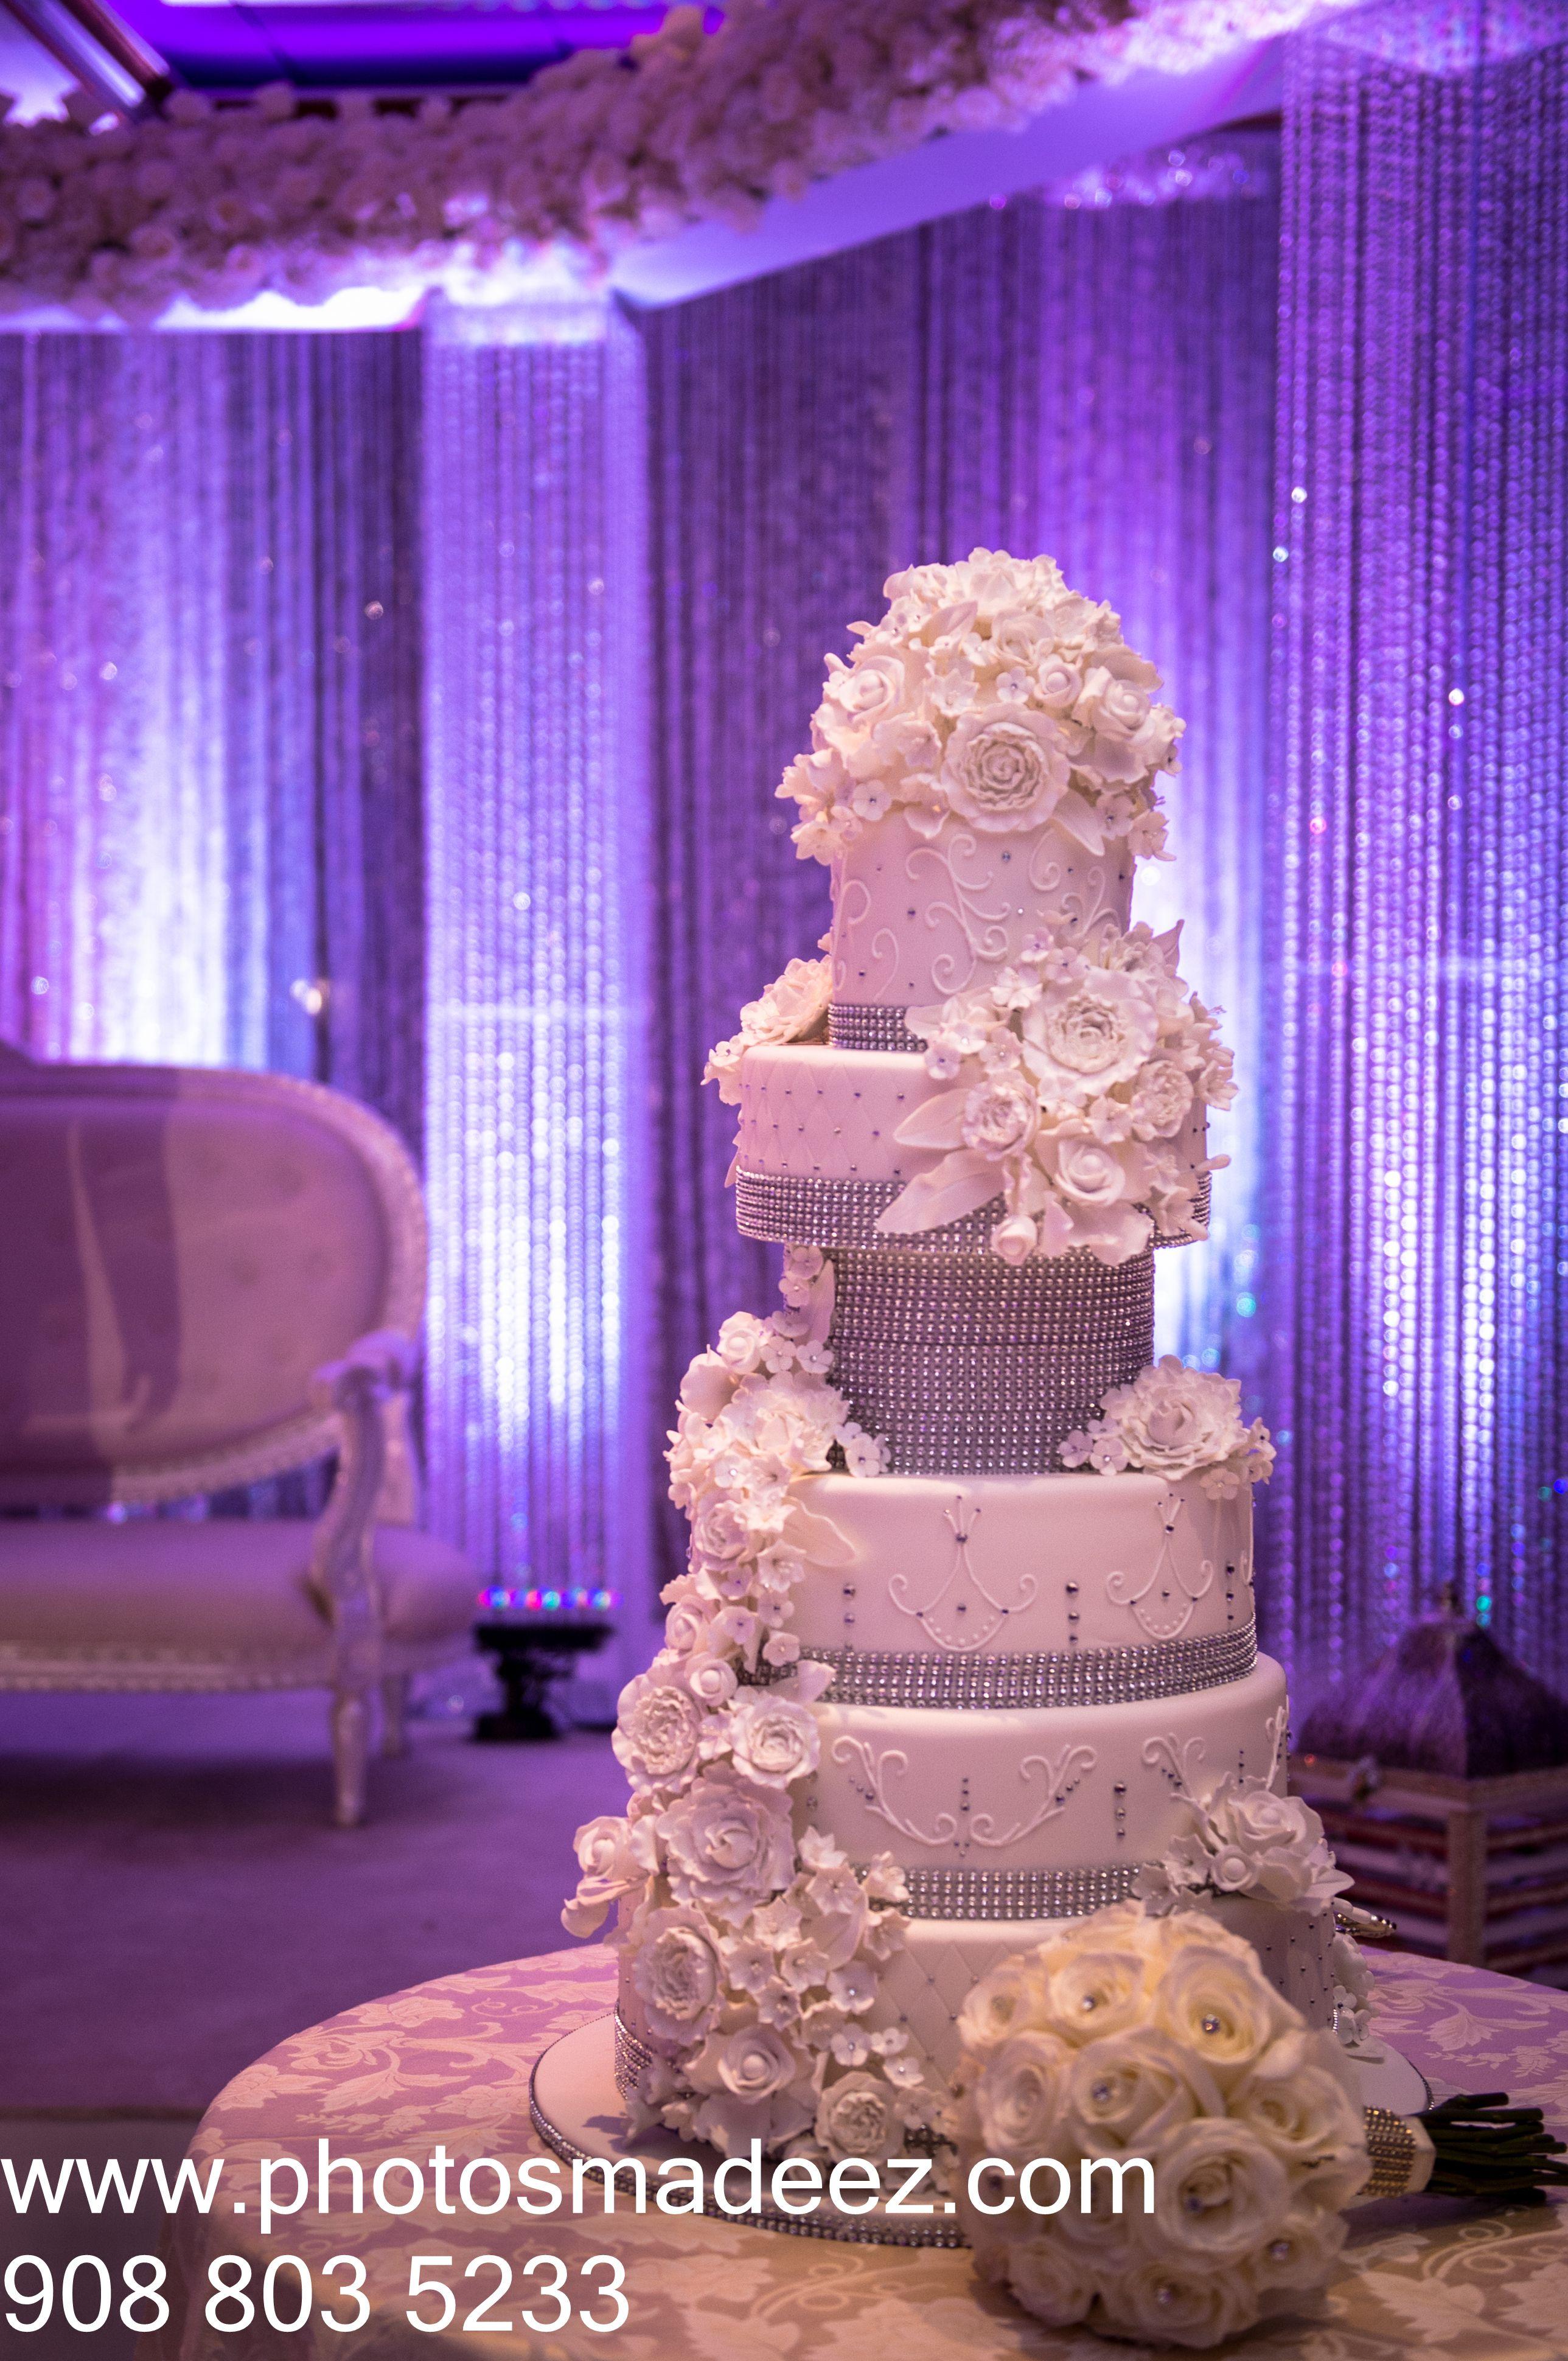 Best wedding cakes long island - Beautiful Wedding Cake At The Vip Country Club Bangladeshi Wedding By Photosmadeez Long Island